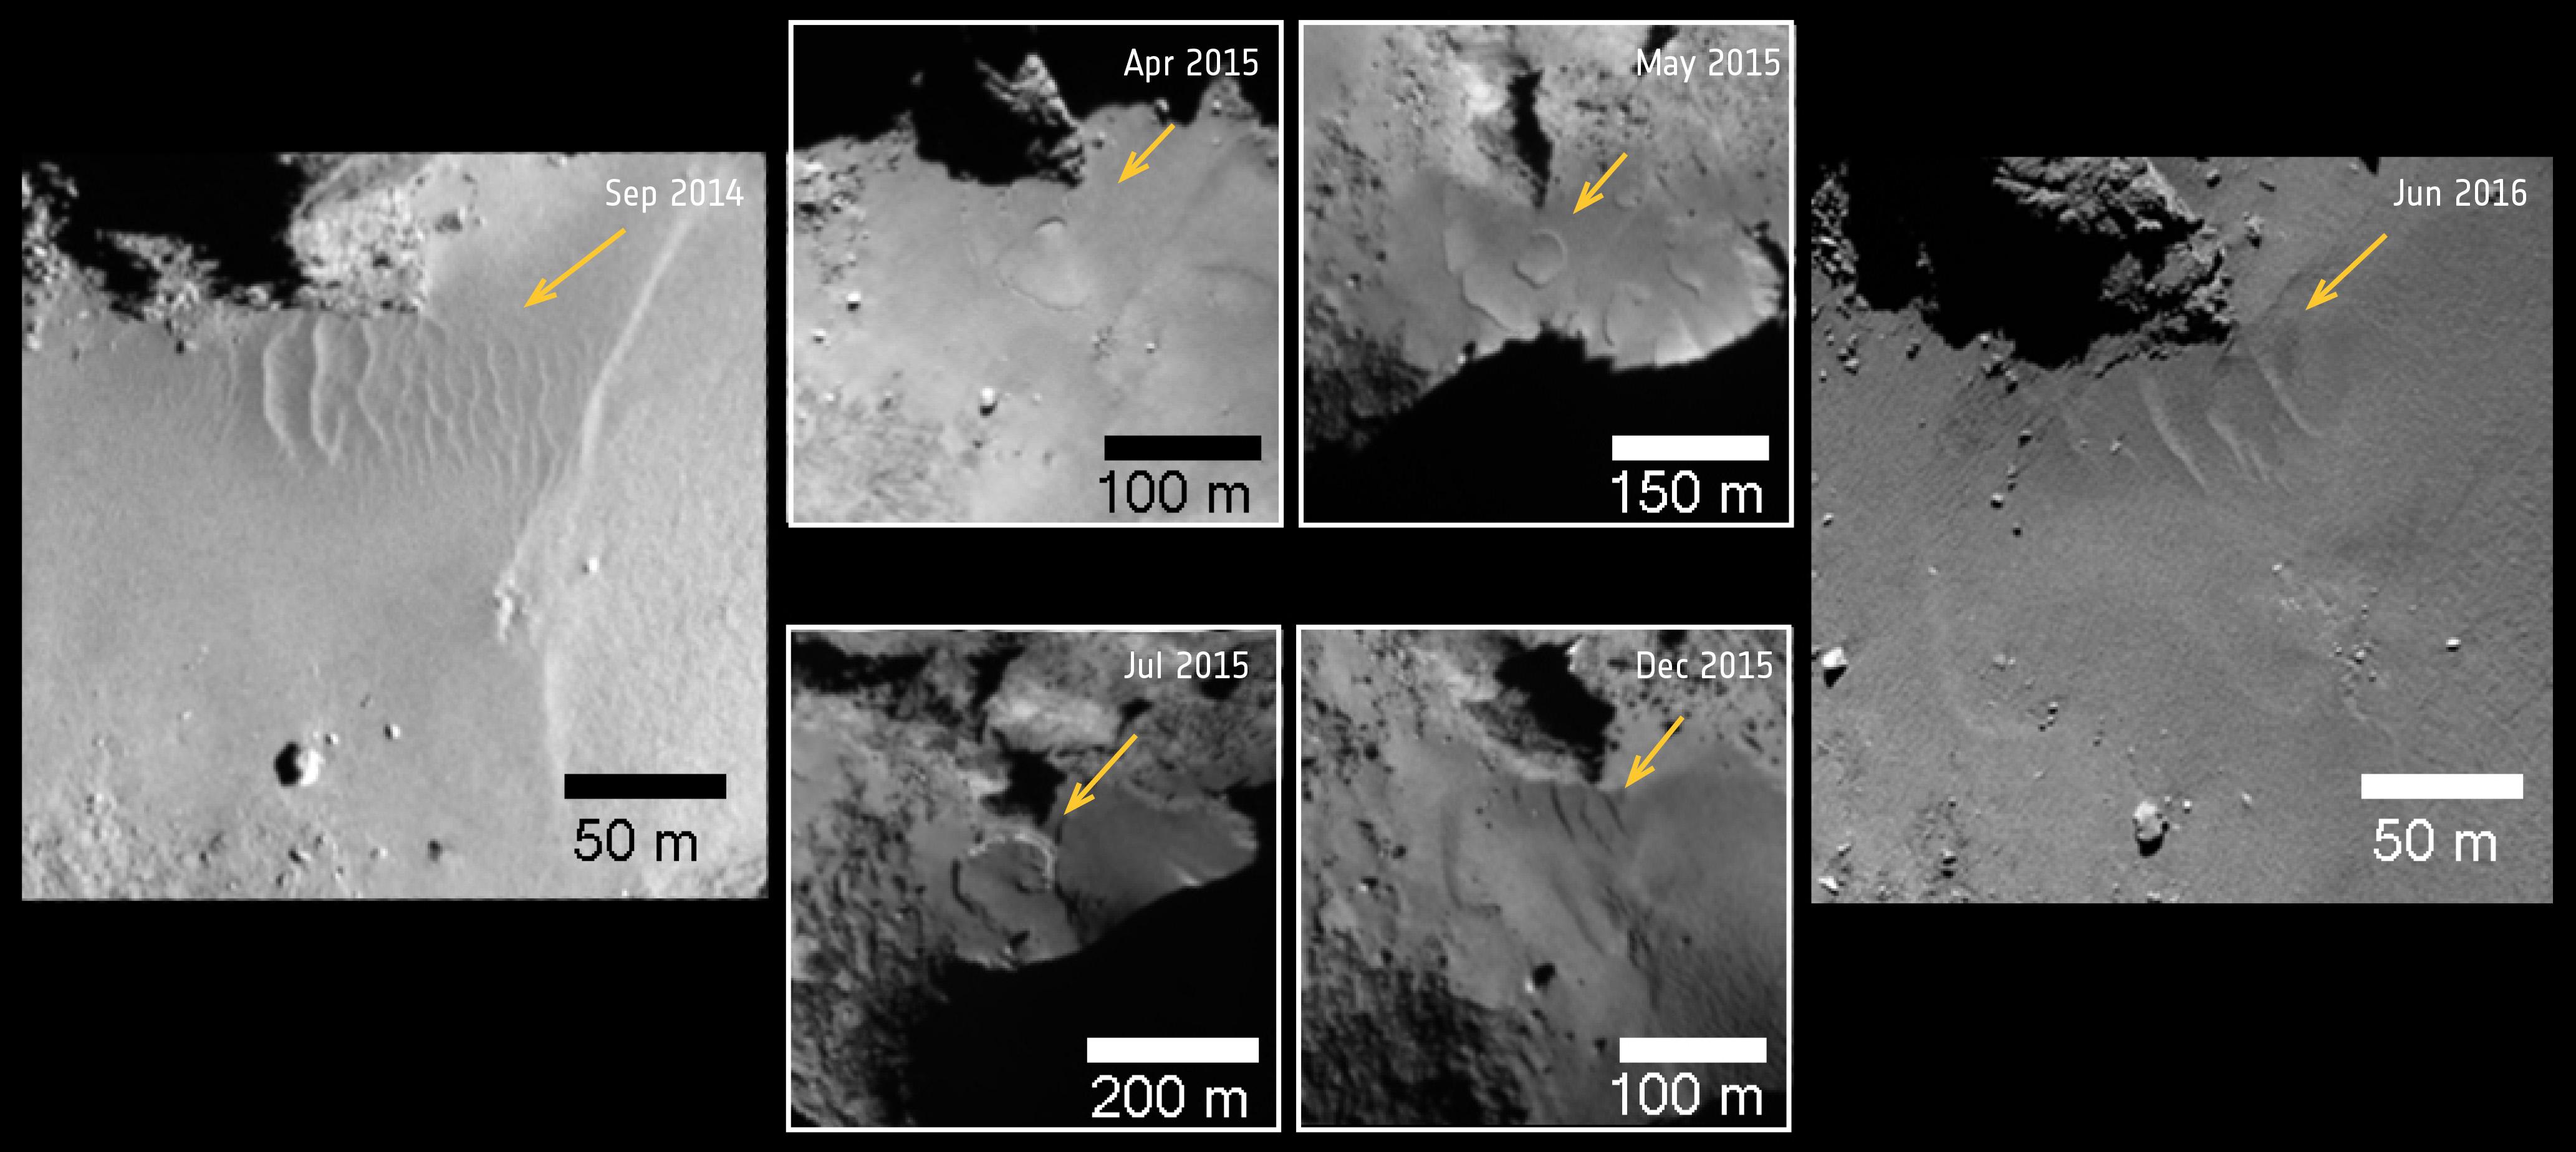 1567215191061-ESA_Rosetta_CometChanges_RippleScarp.jpg